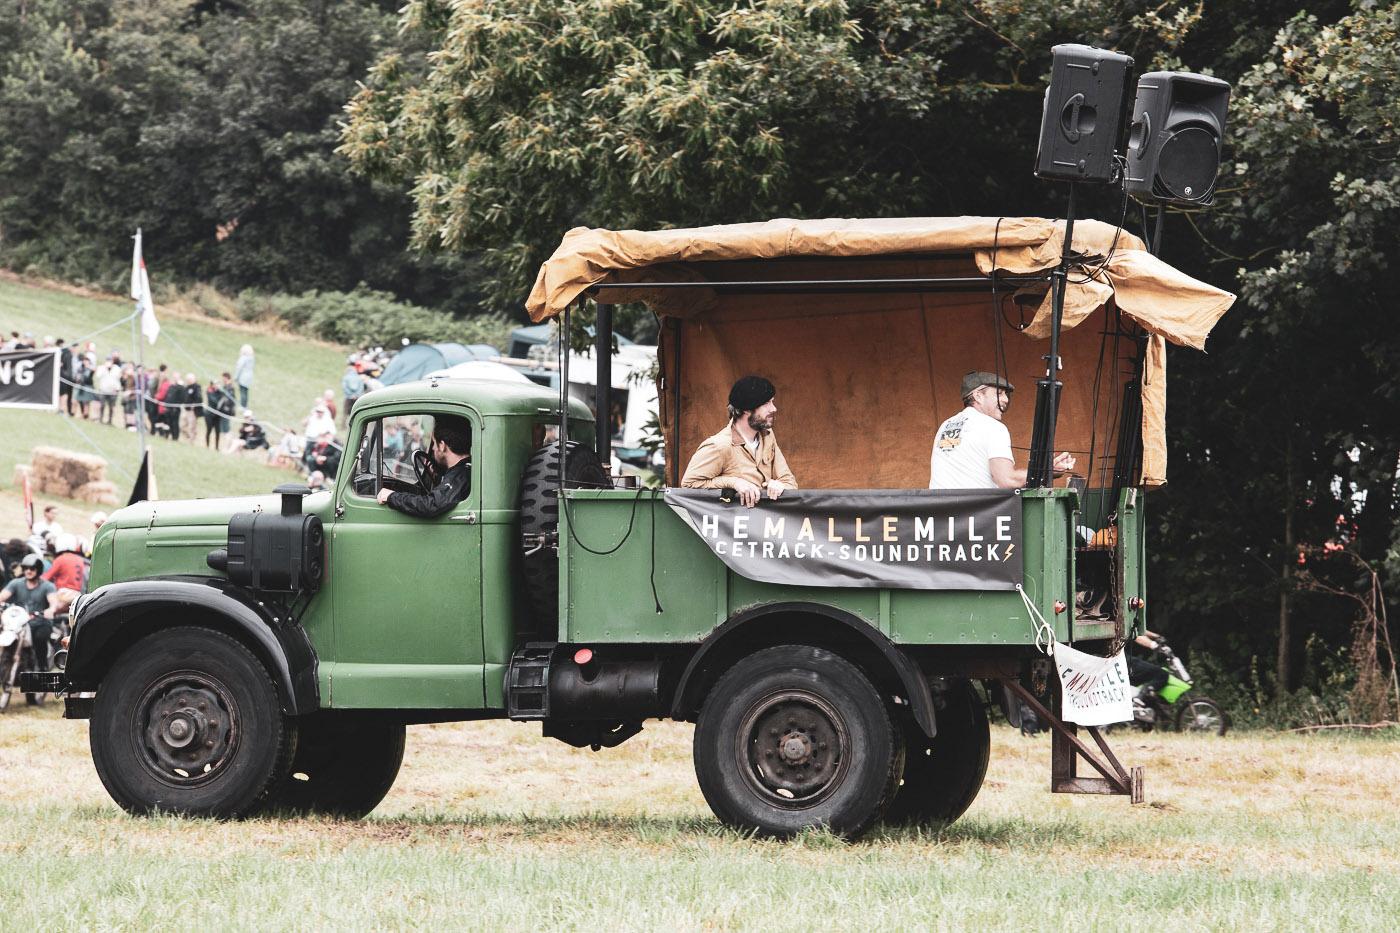 Truck Malle Mile 2019